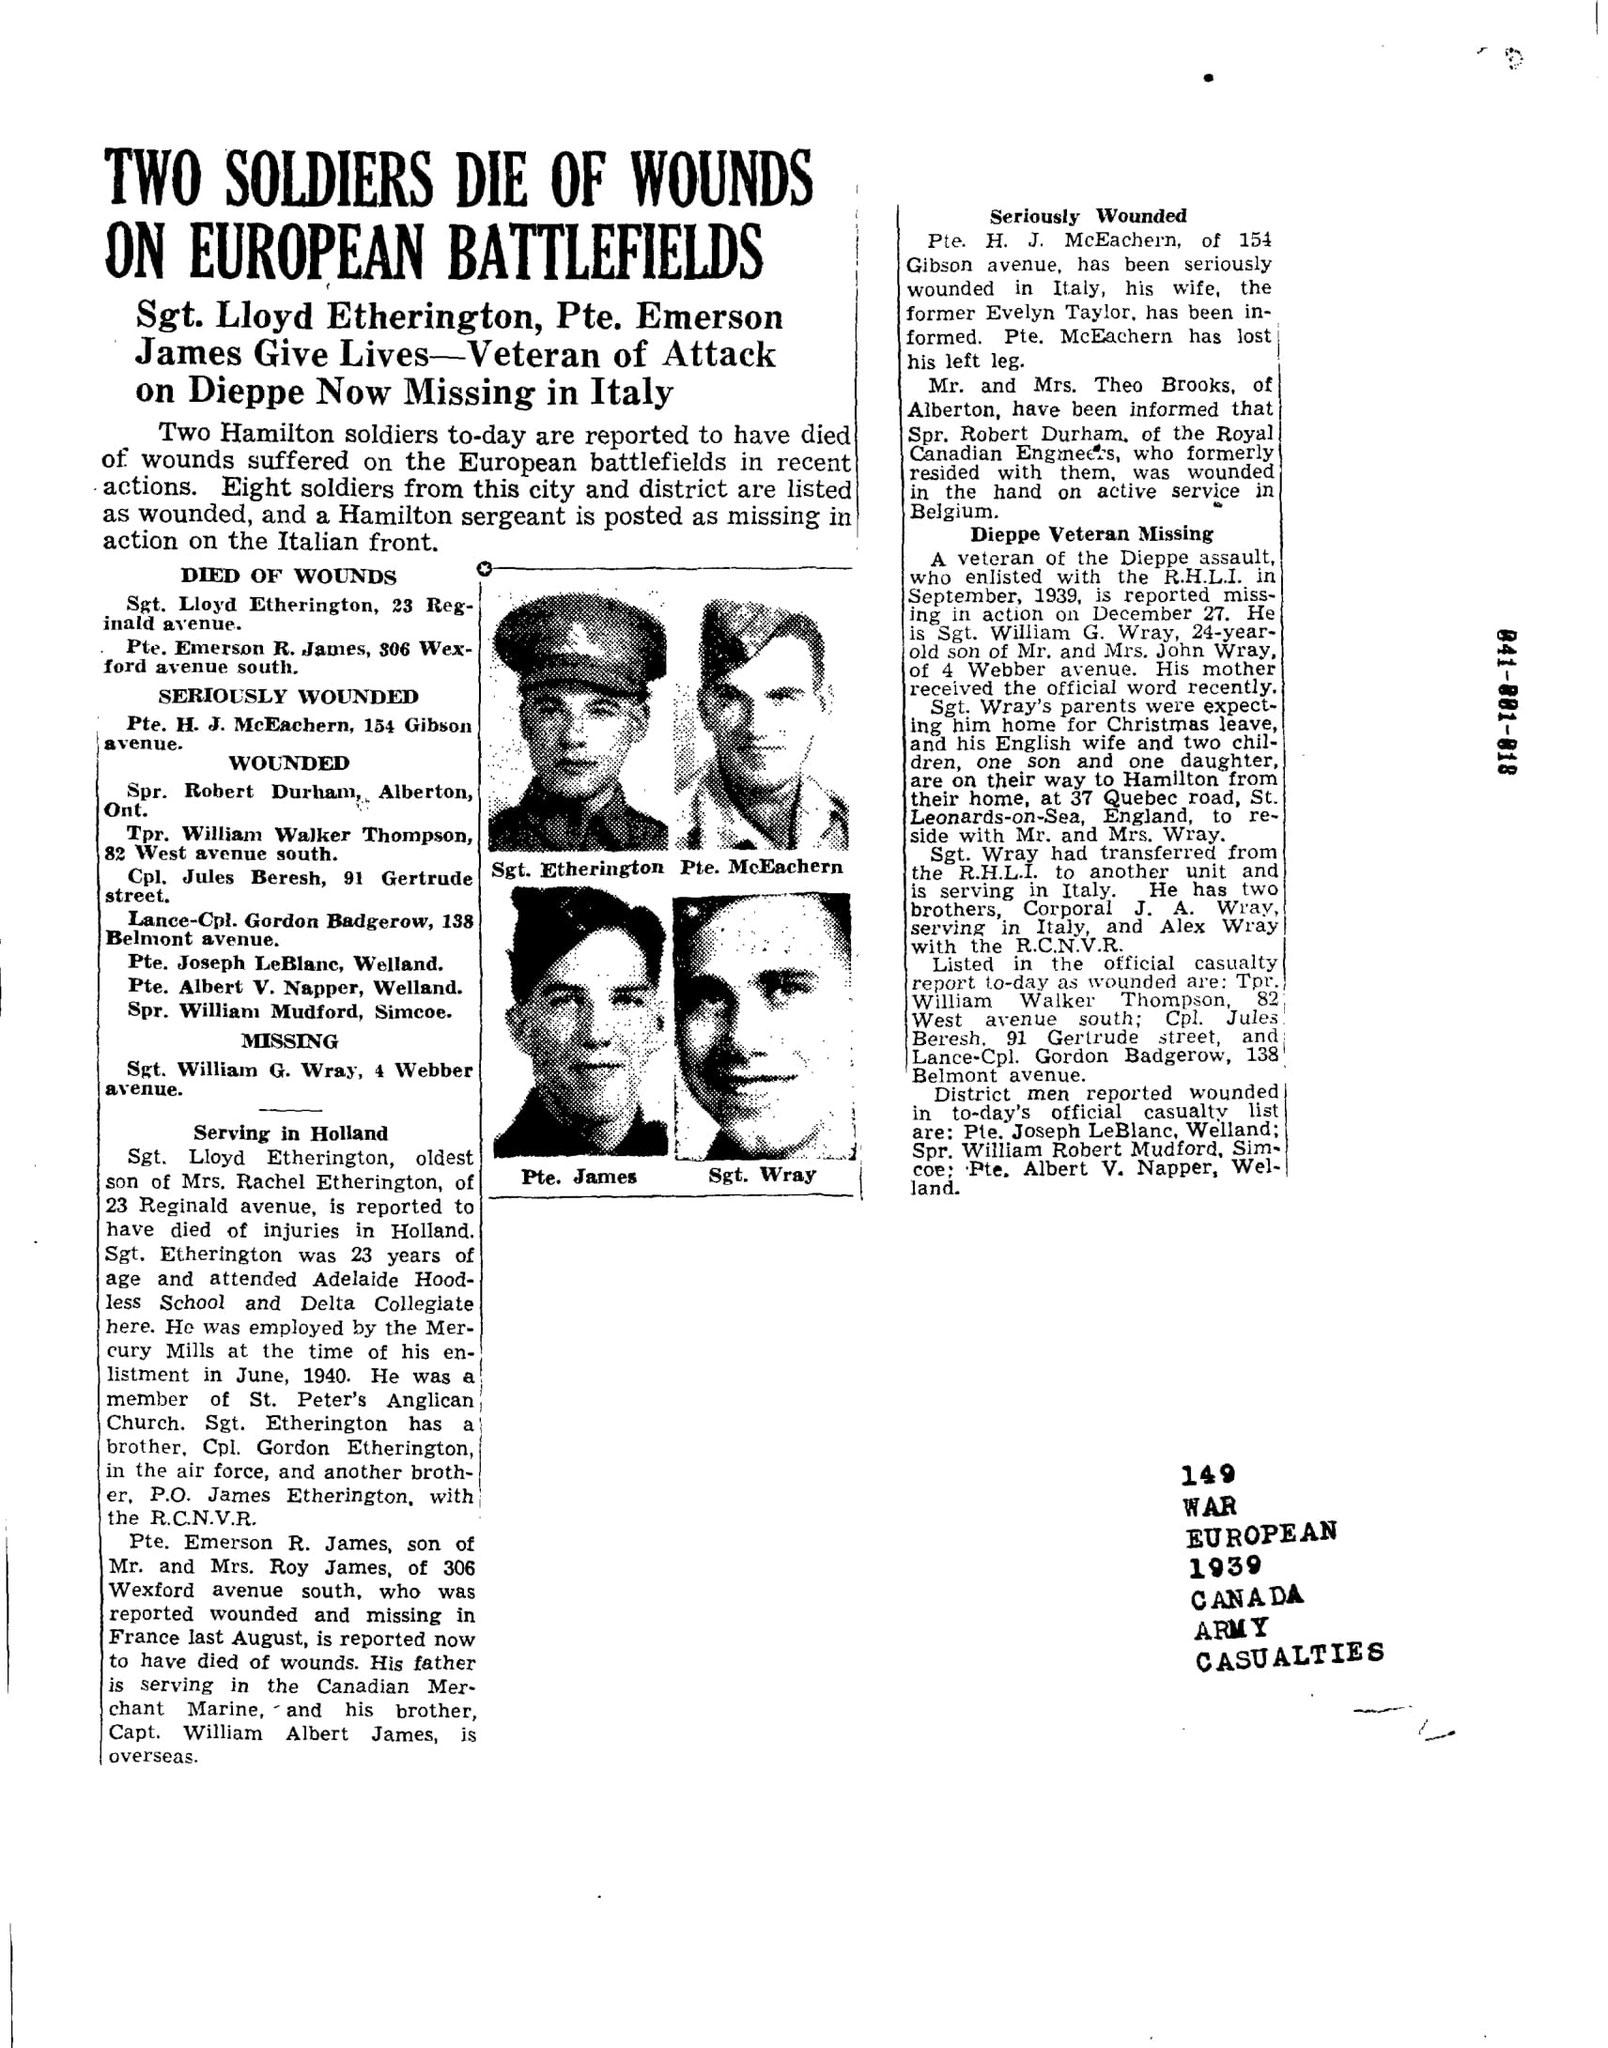 Hamilton Spectator 1-12-1945